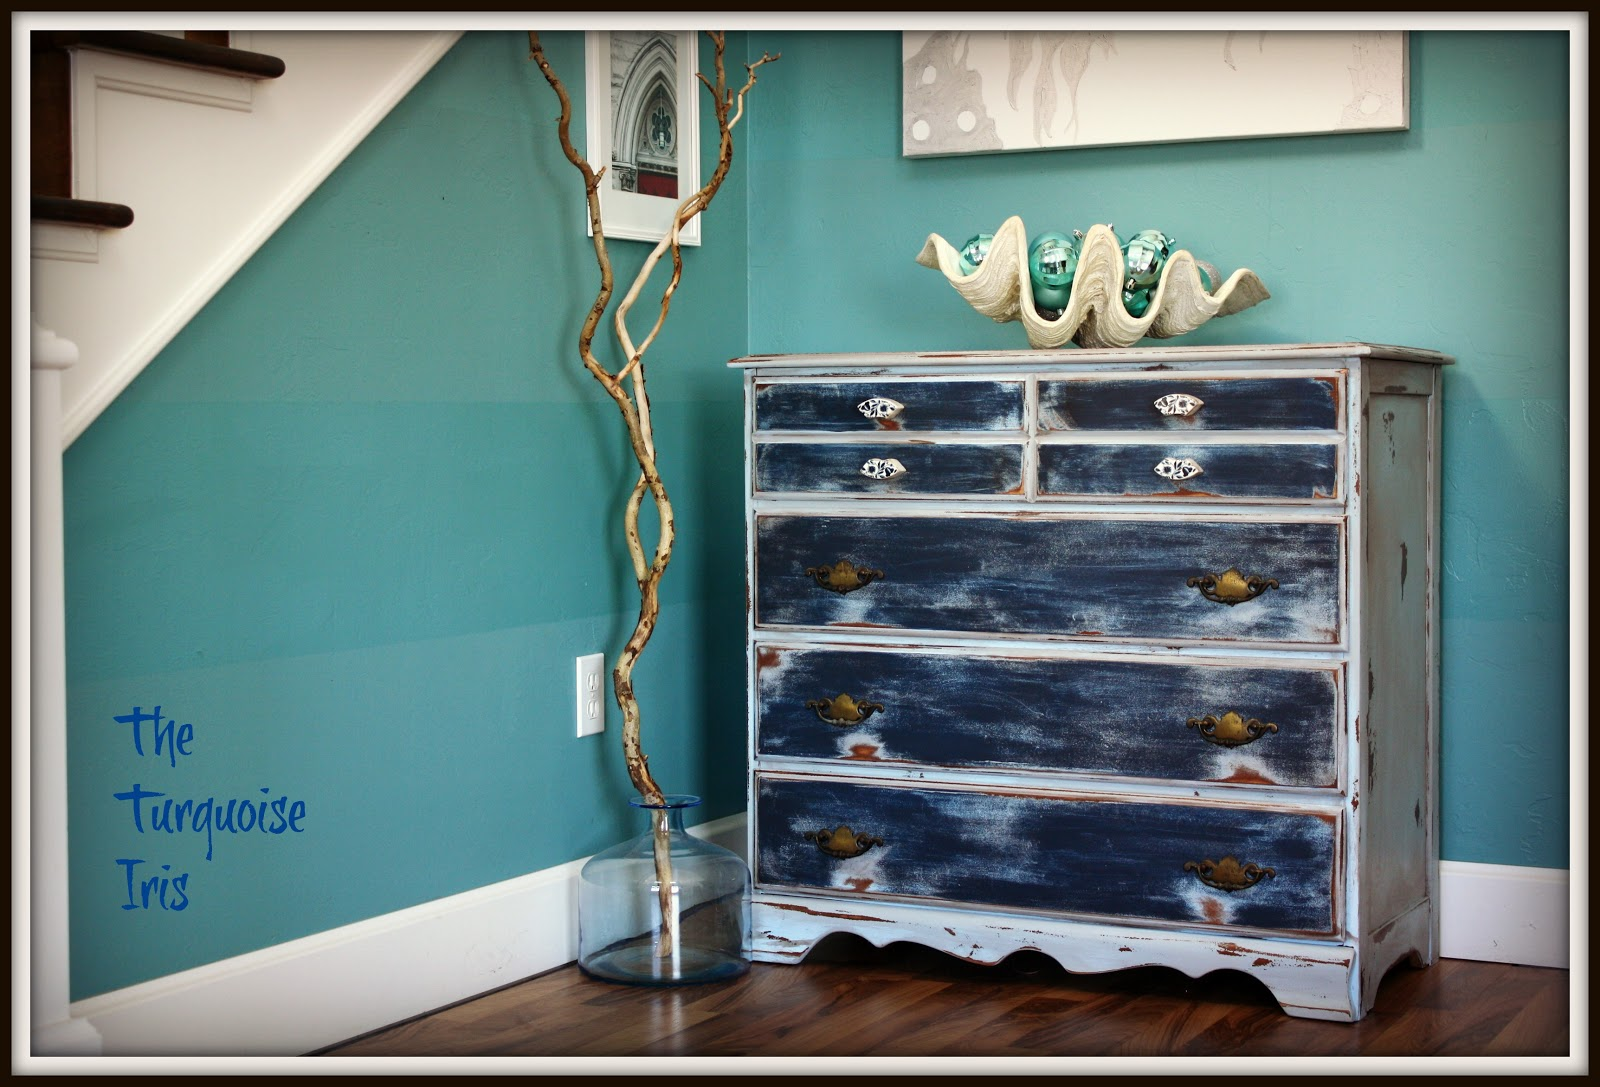 http://1.bp.blogspot.com/-LTlIaY8vxD4/UMij1Gx3XxI/AAAAAAAADQw/Vi-fVDOAt60/s1600/baby+blue+and+navy+EDITED+petite+dresser+003.jpg